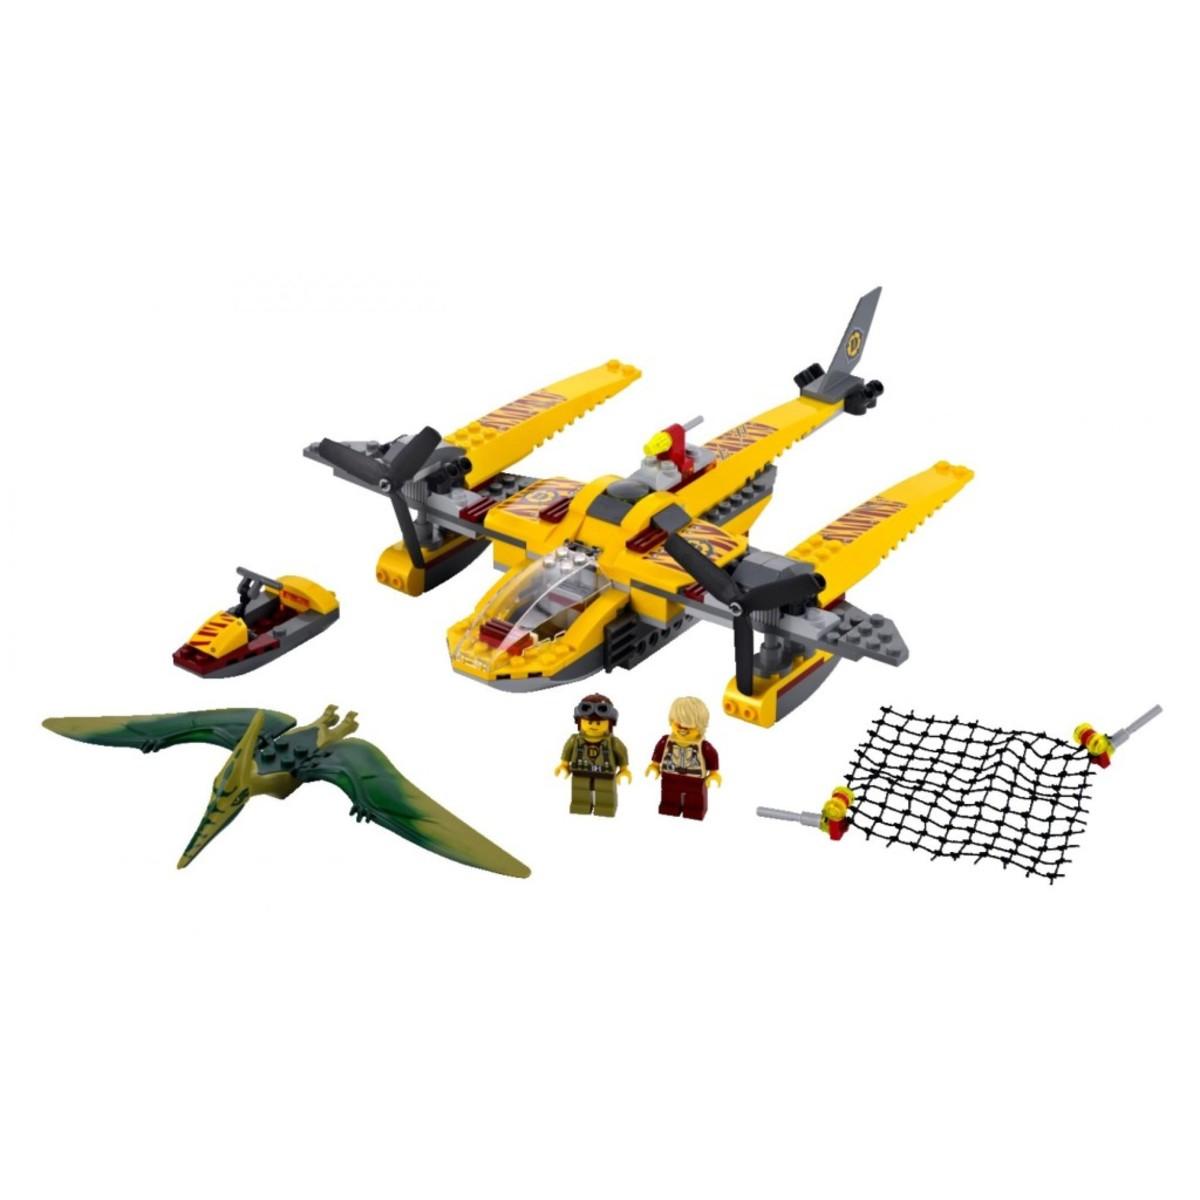 LEGO Dino Ocean Interceptor 5888 Assembled